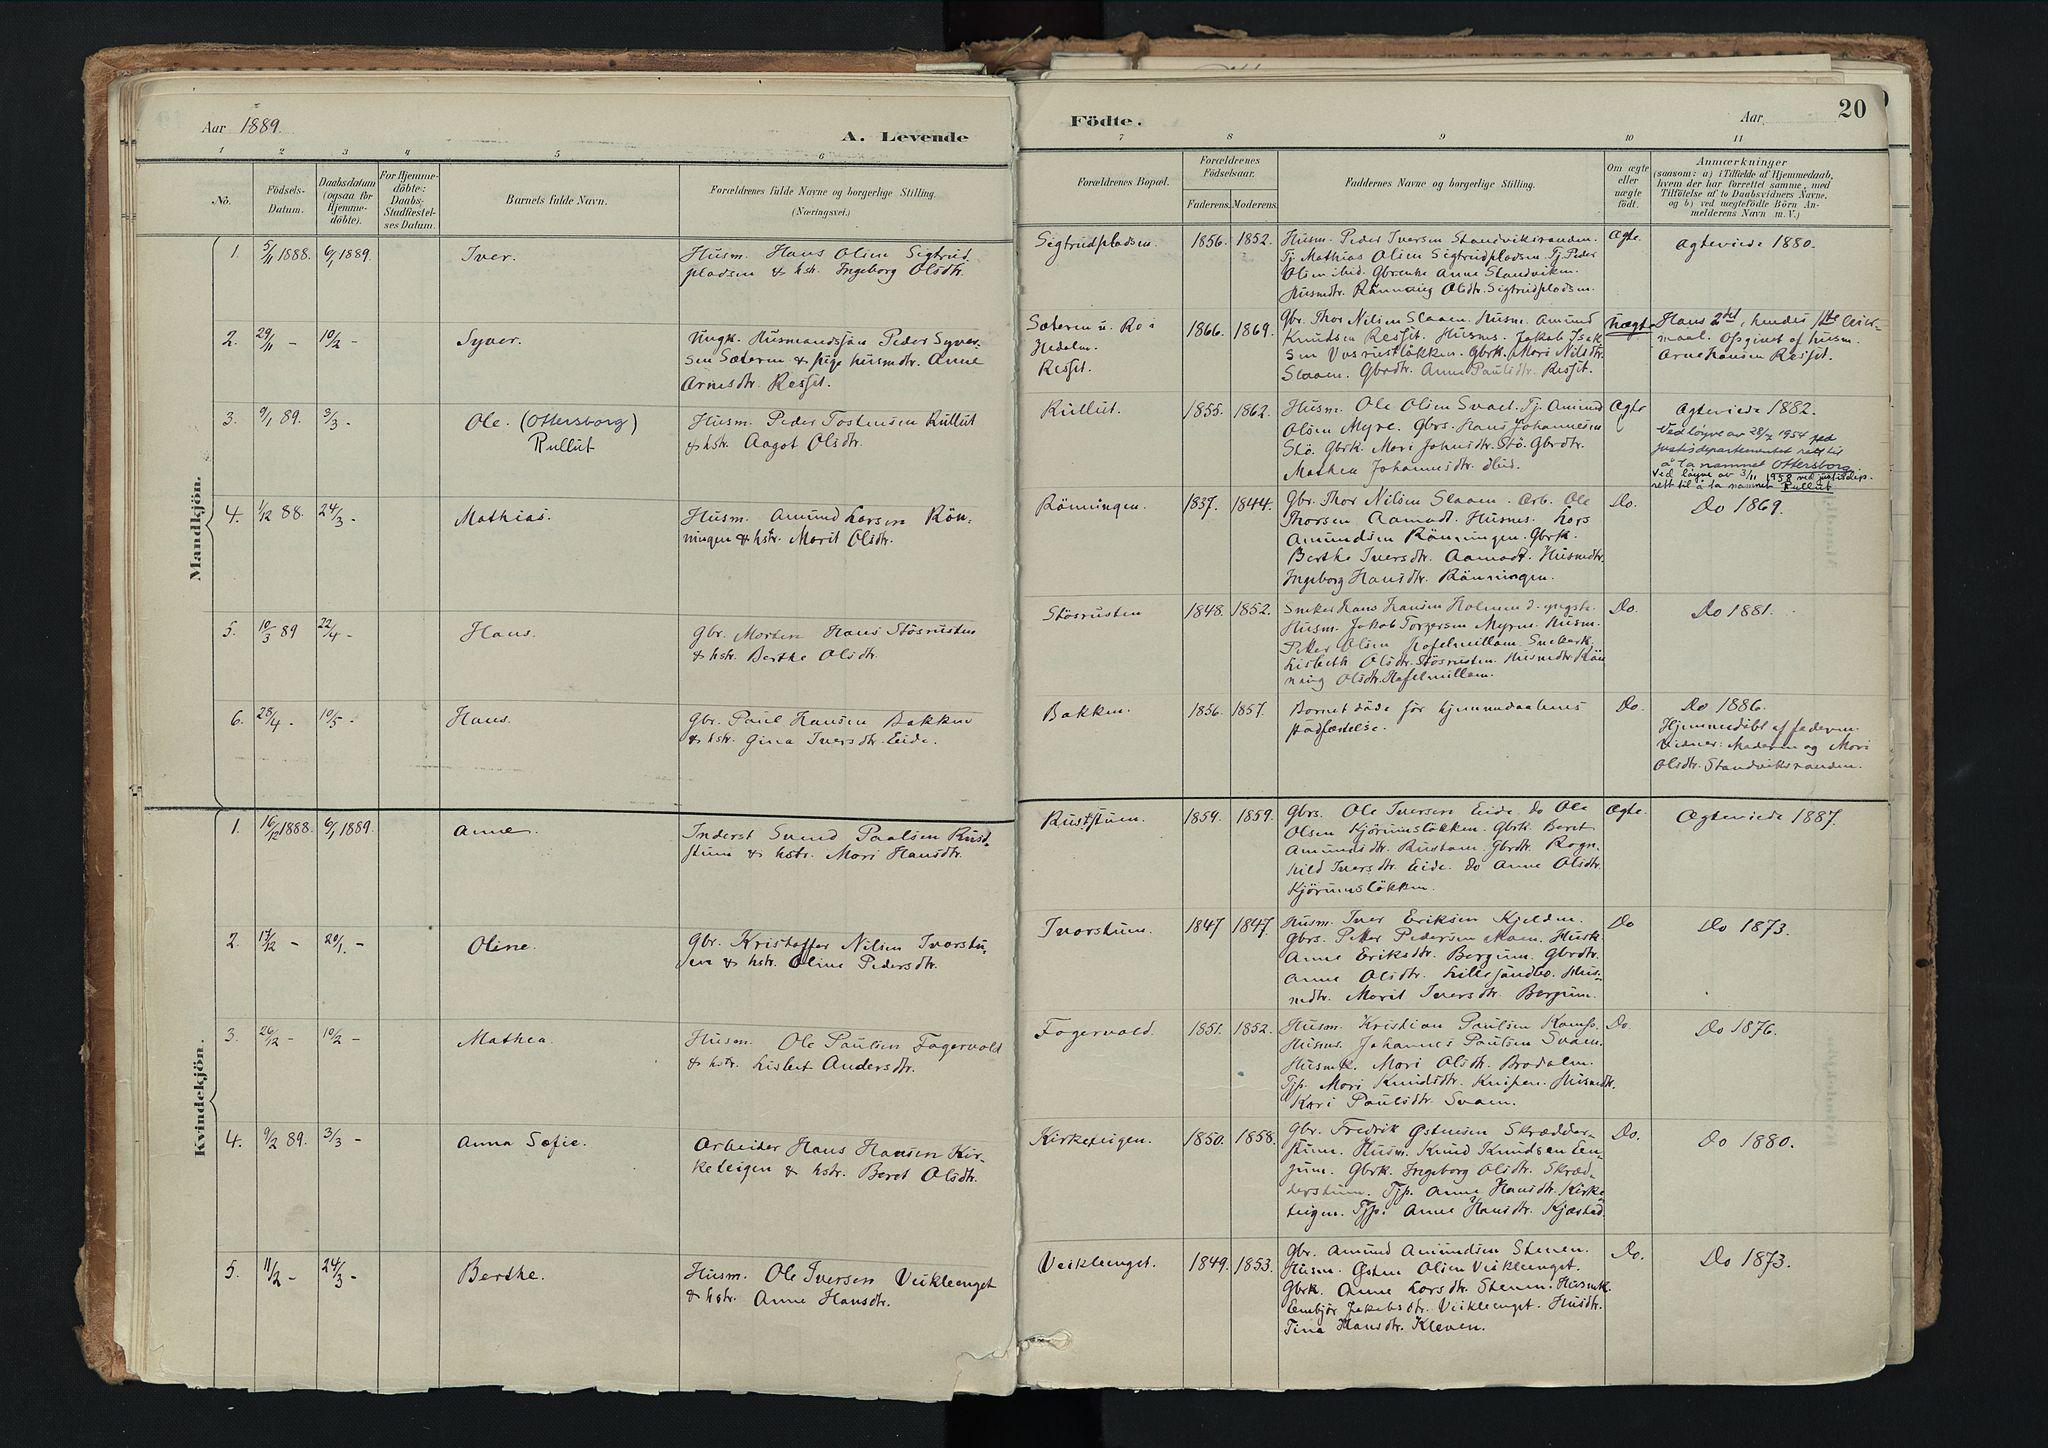 SAH, Nord-Fron prestekontor, Ministerialbok nr. 3, 1884-1914, s. 20